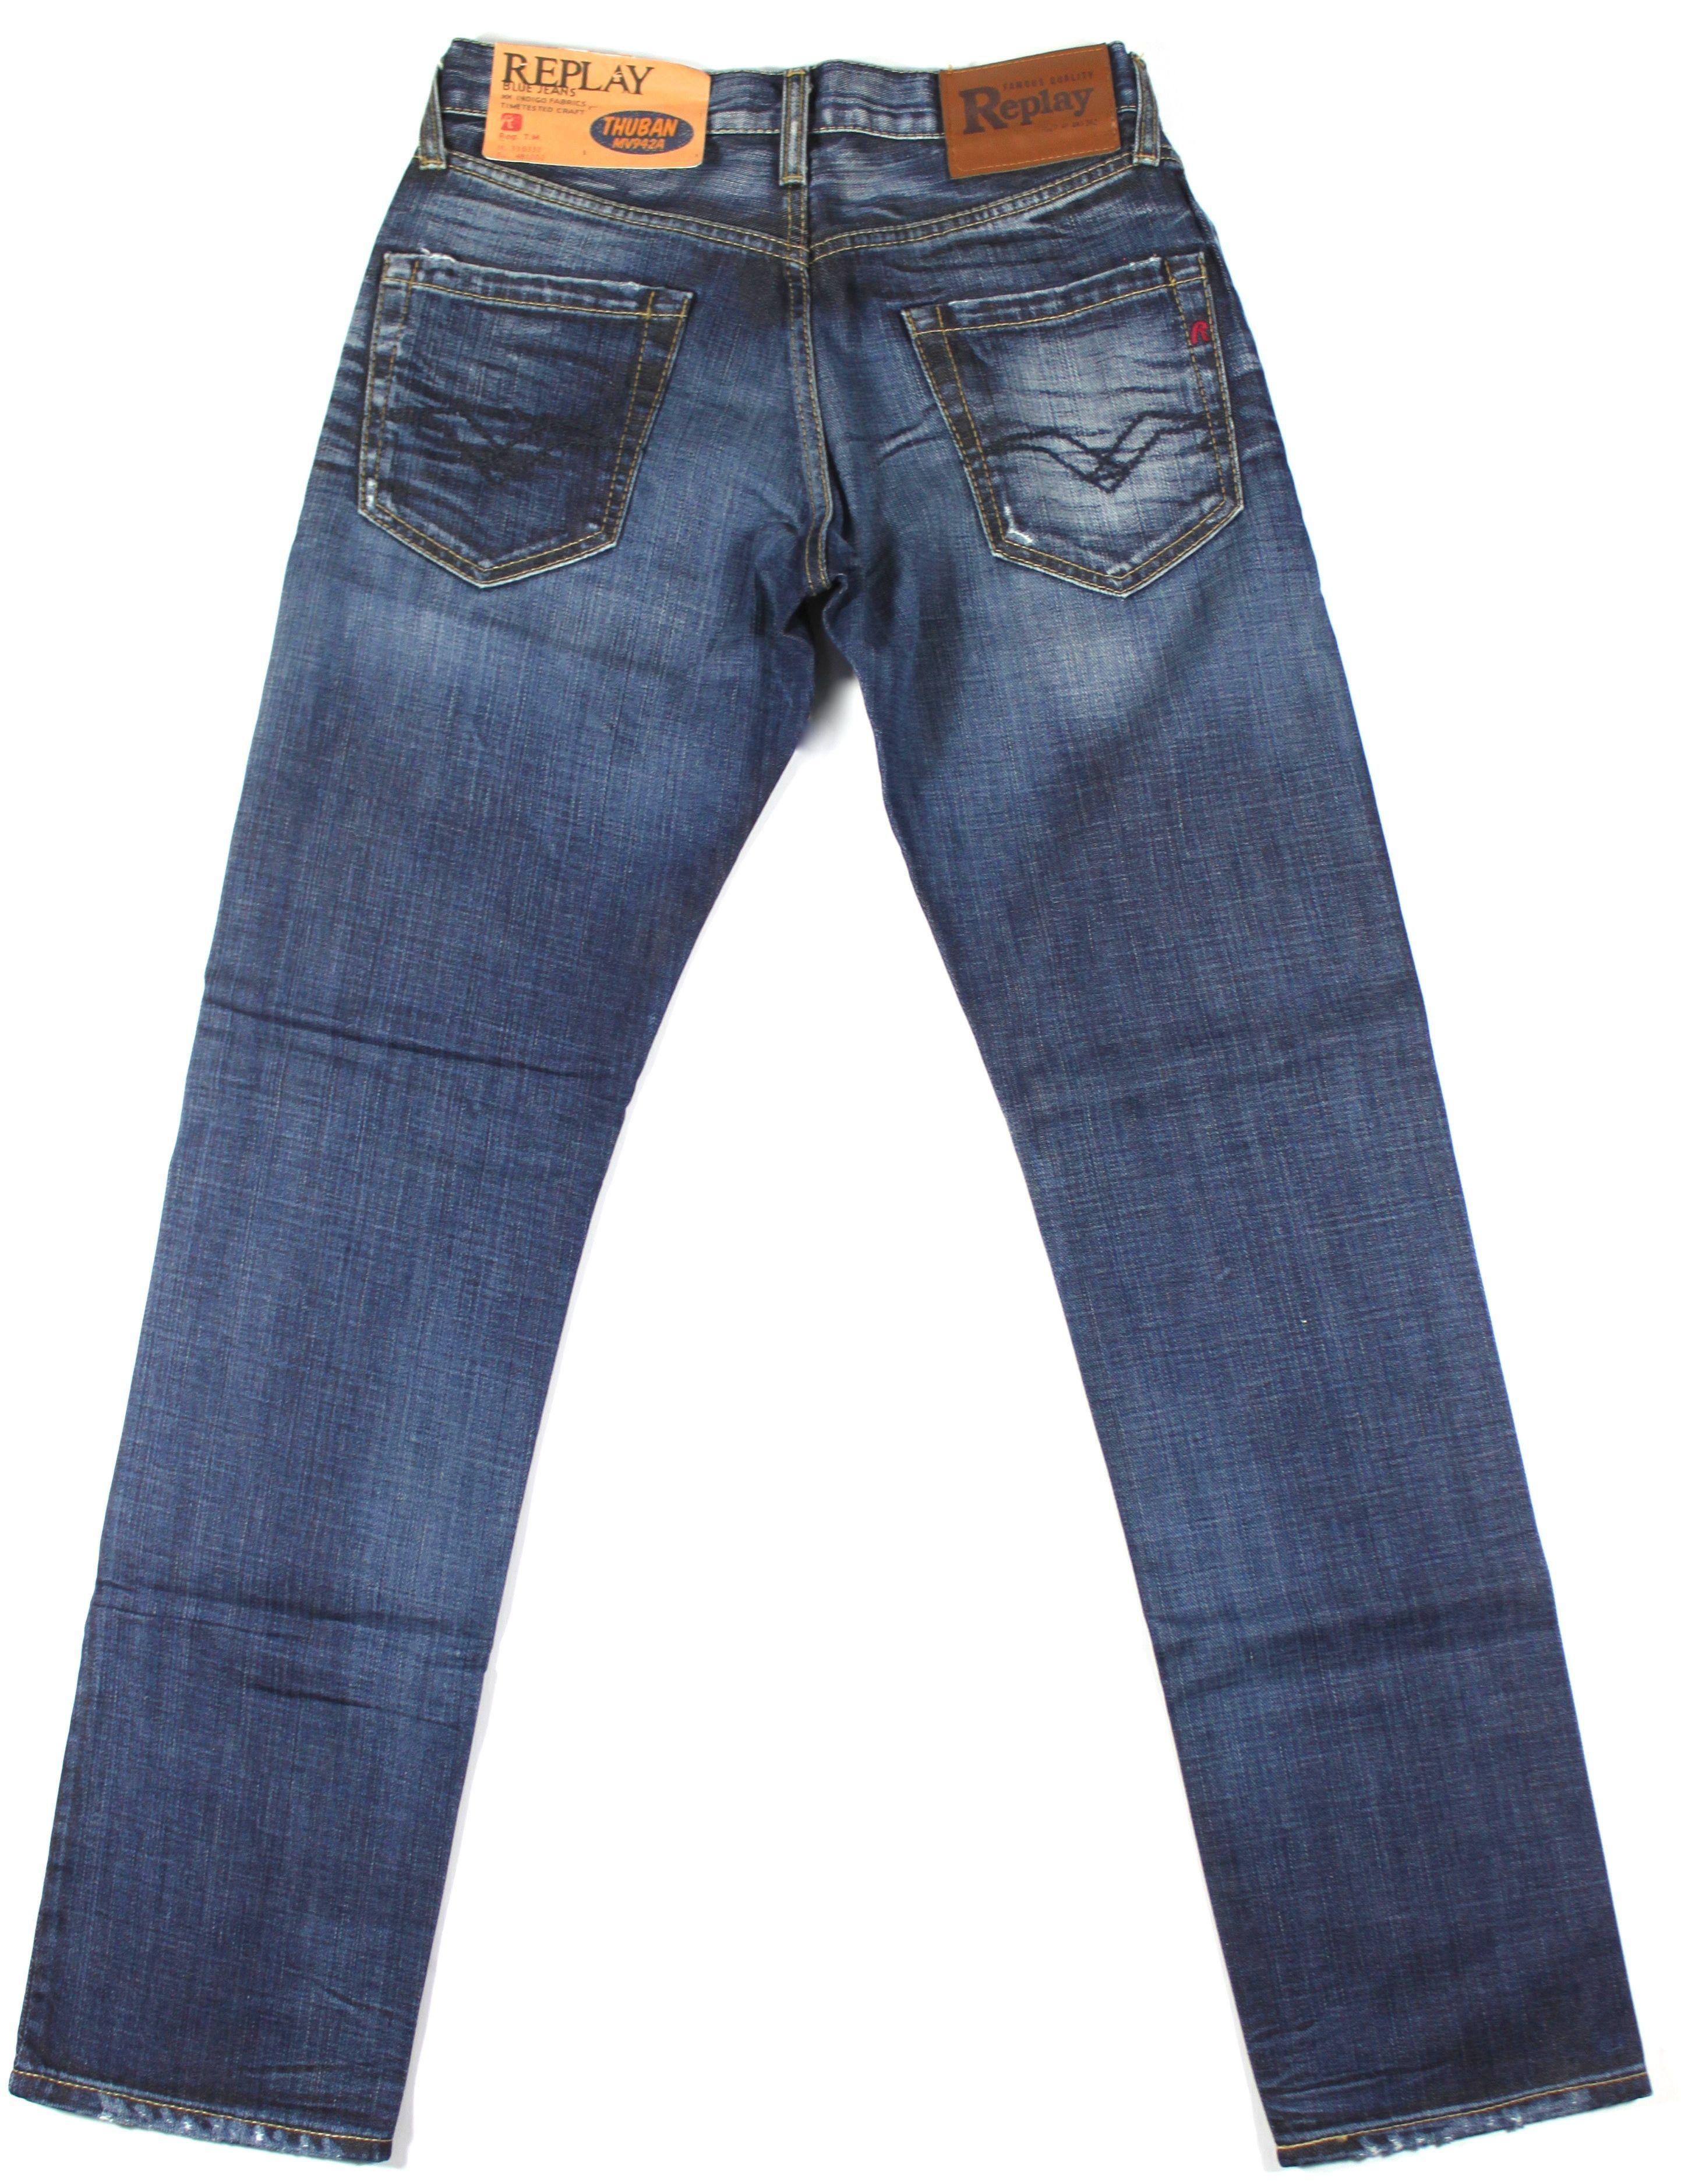 Replay MV942A Thuban Jeans